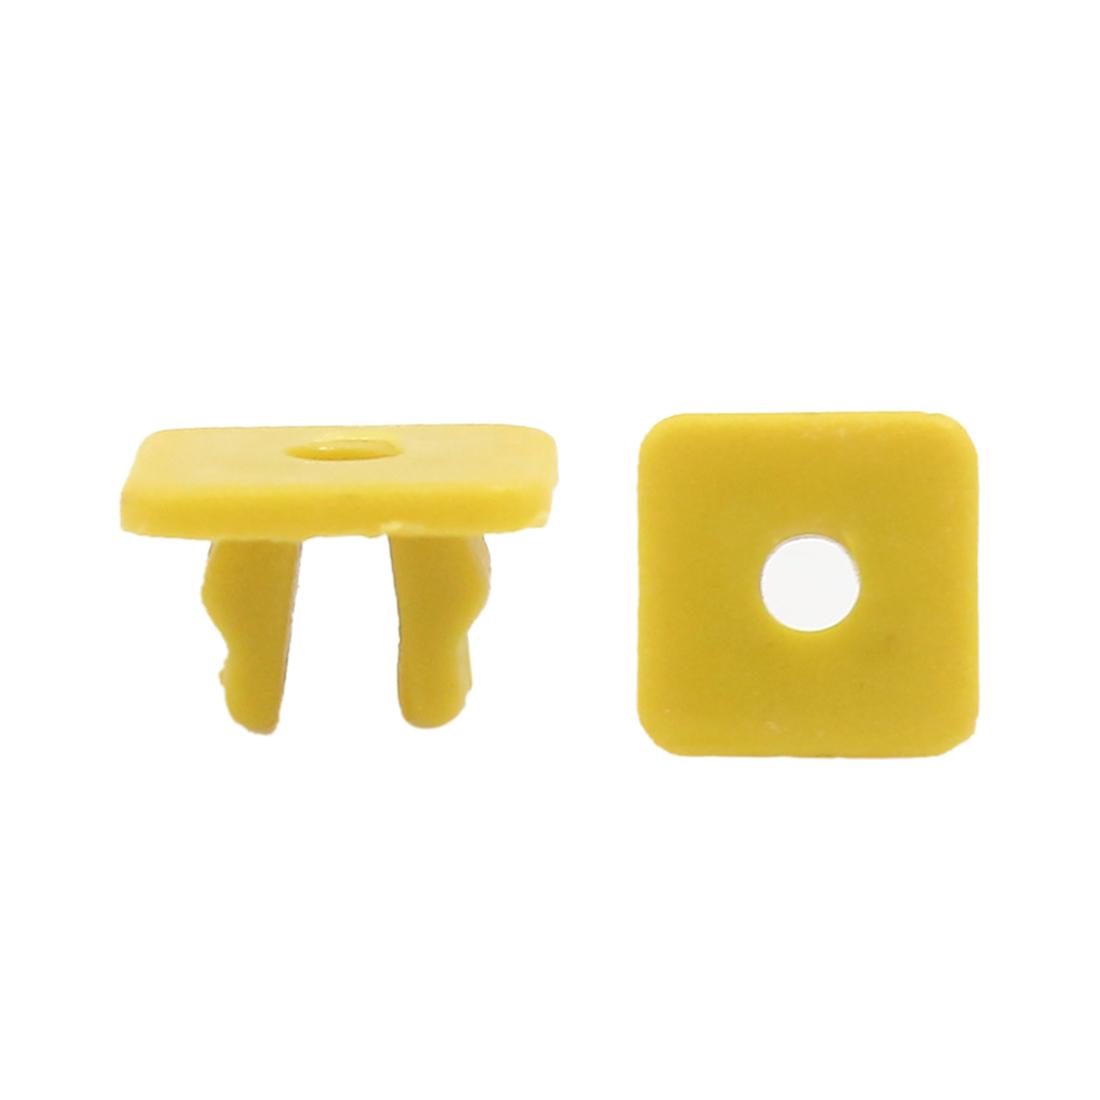 30Pcs Universal Car Plastic Rivets Bumper Fender Fastener Retainer Yellow 9 x 8mm